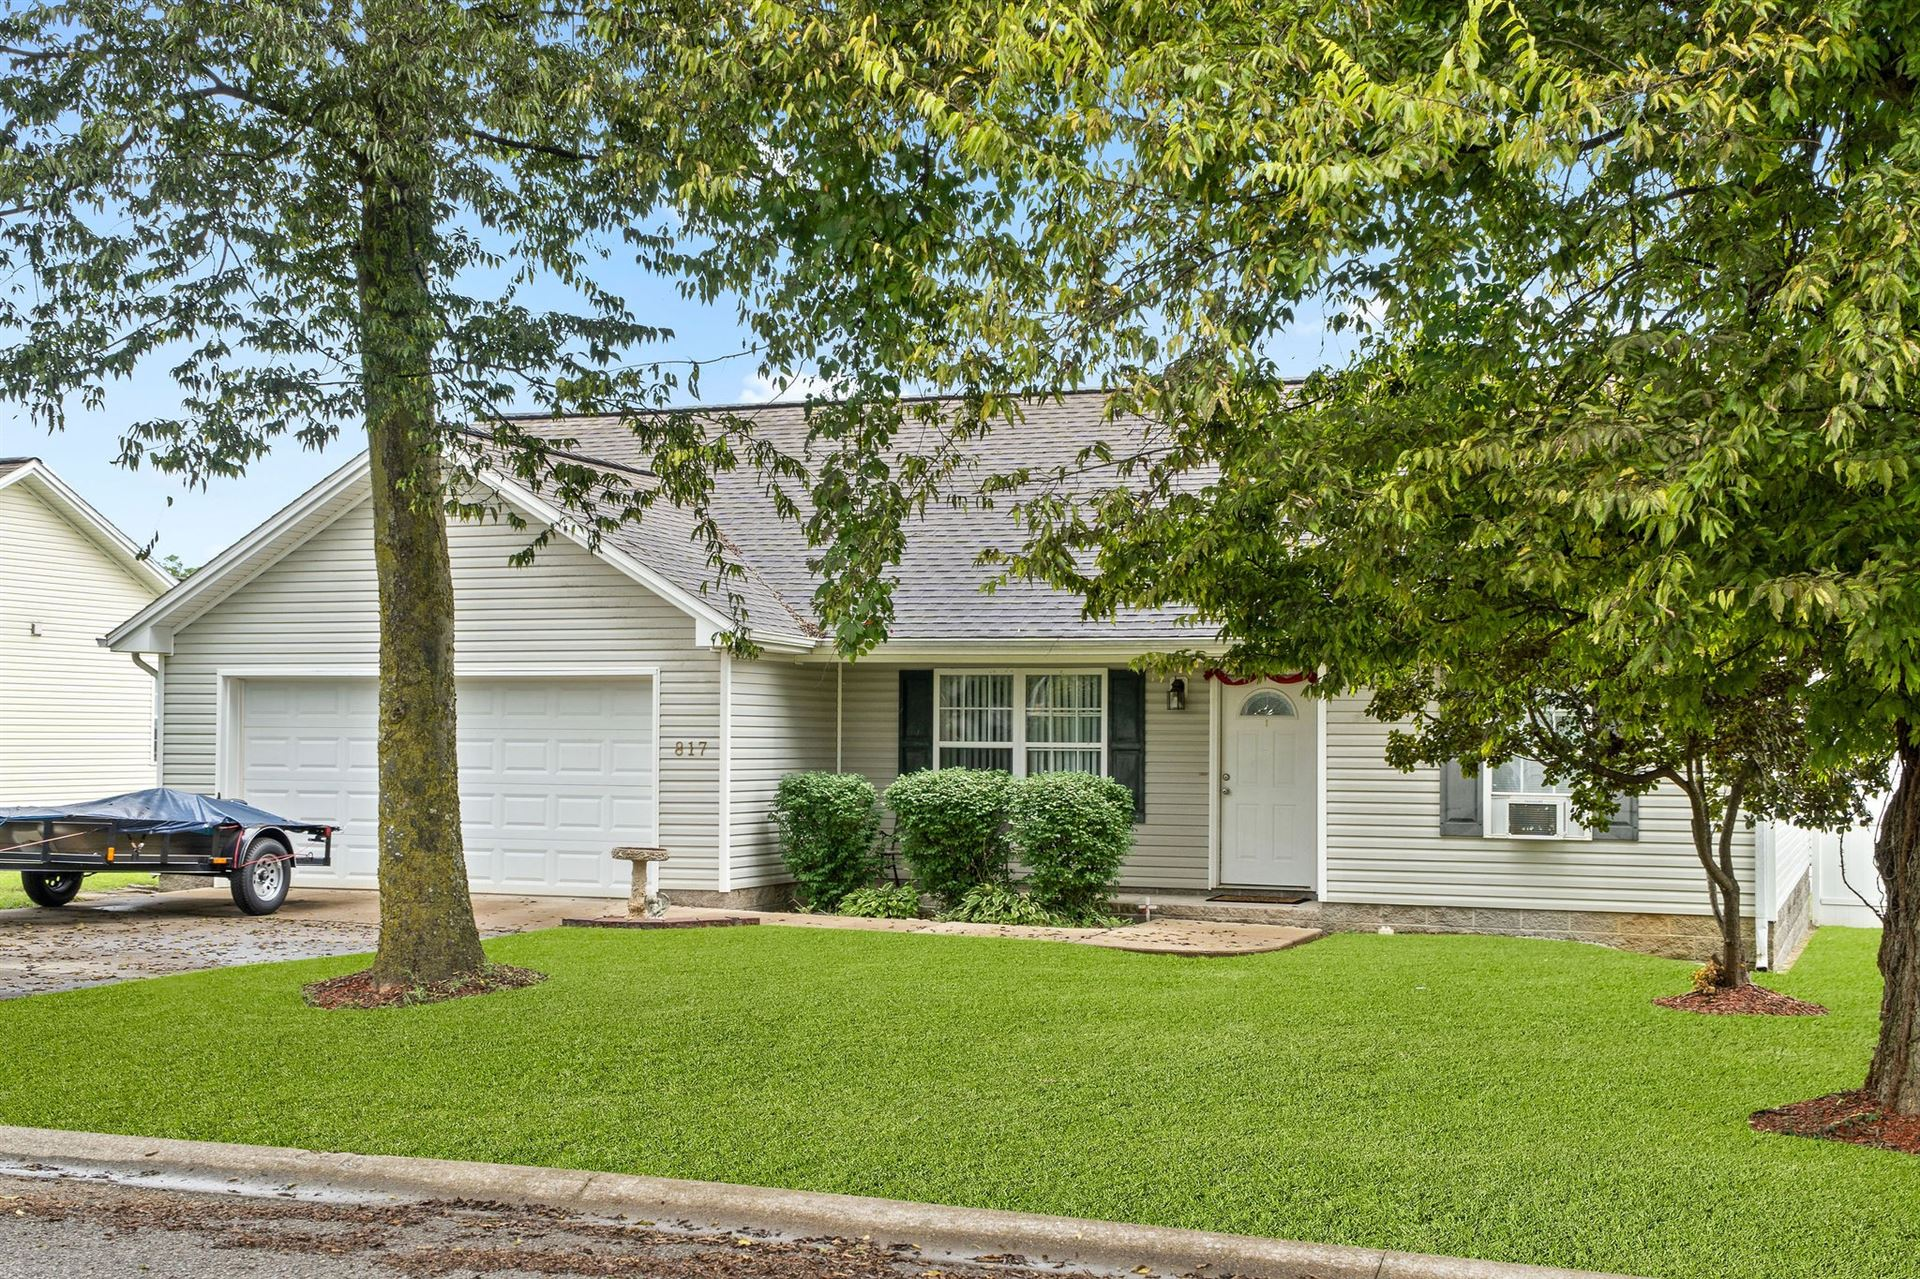 817 Brock Ave, Hopkinsville, KY 42240 - MLS#: 2292683